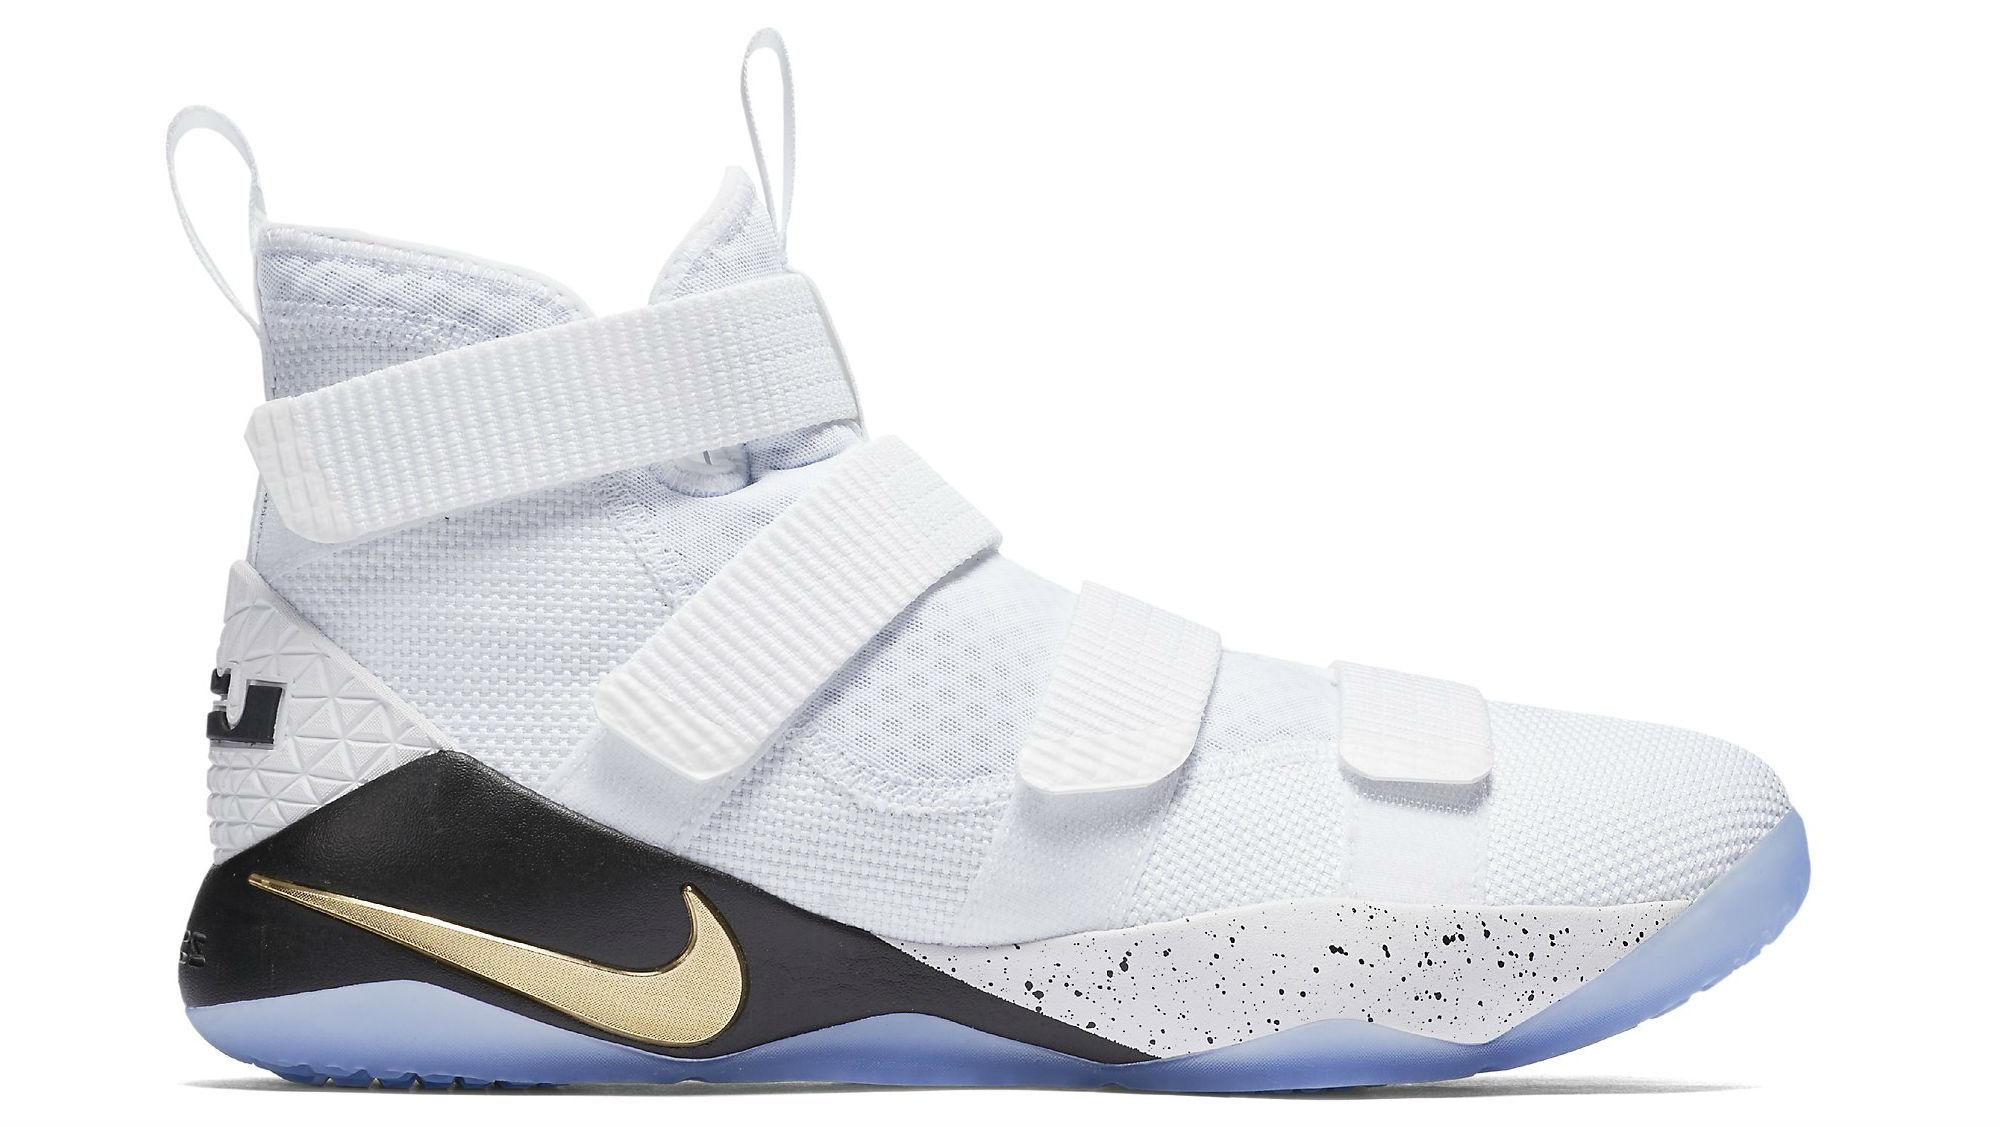 Nike LeBron Soldier 11 White/Metallic Gold-Black